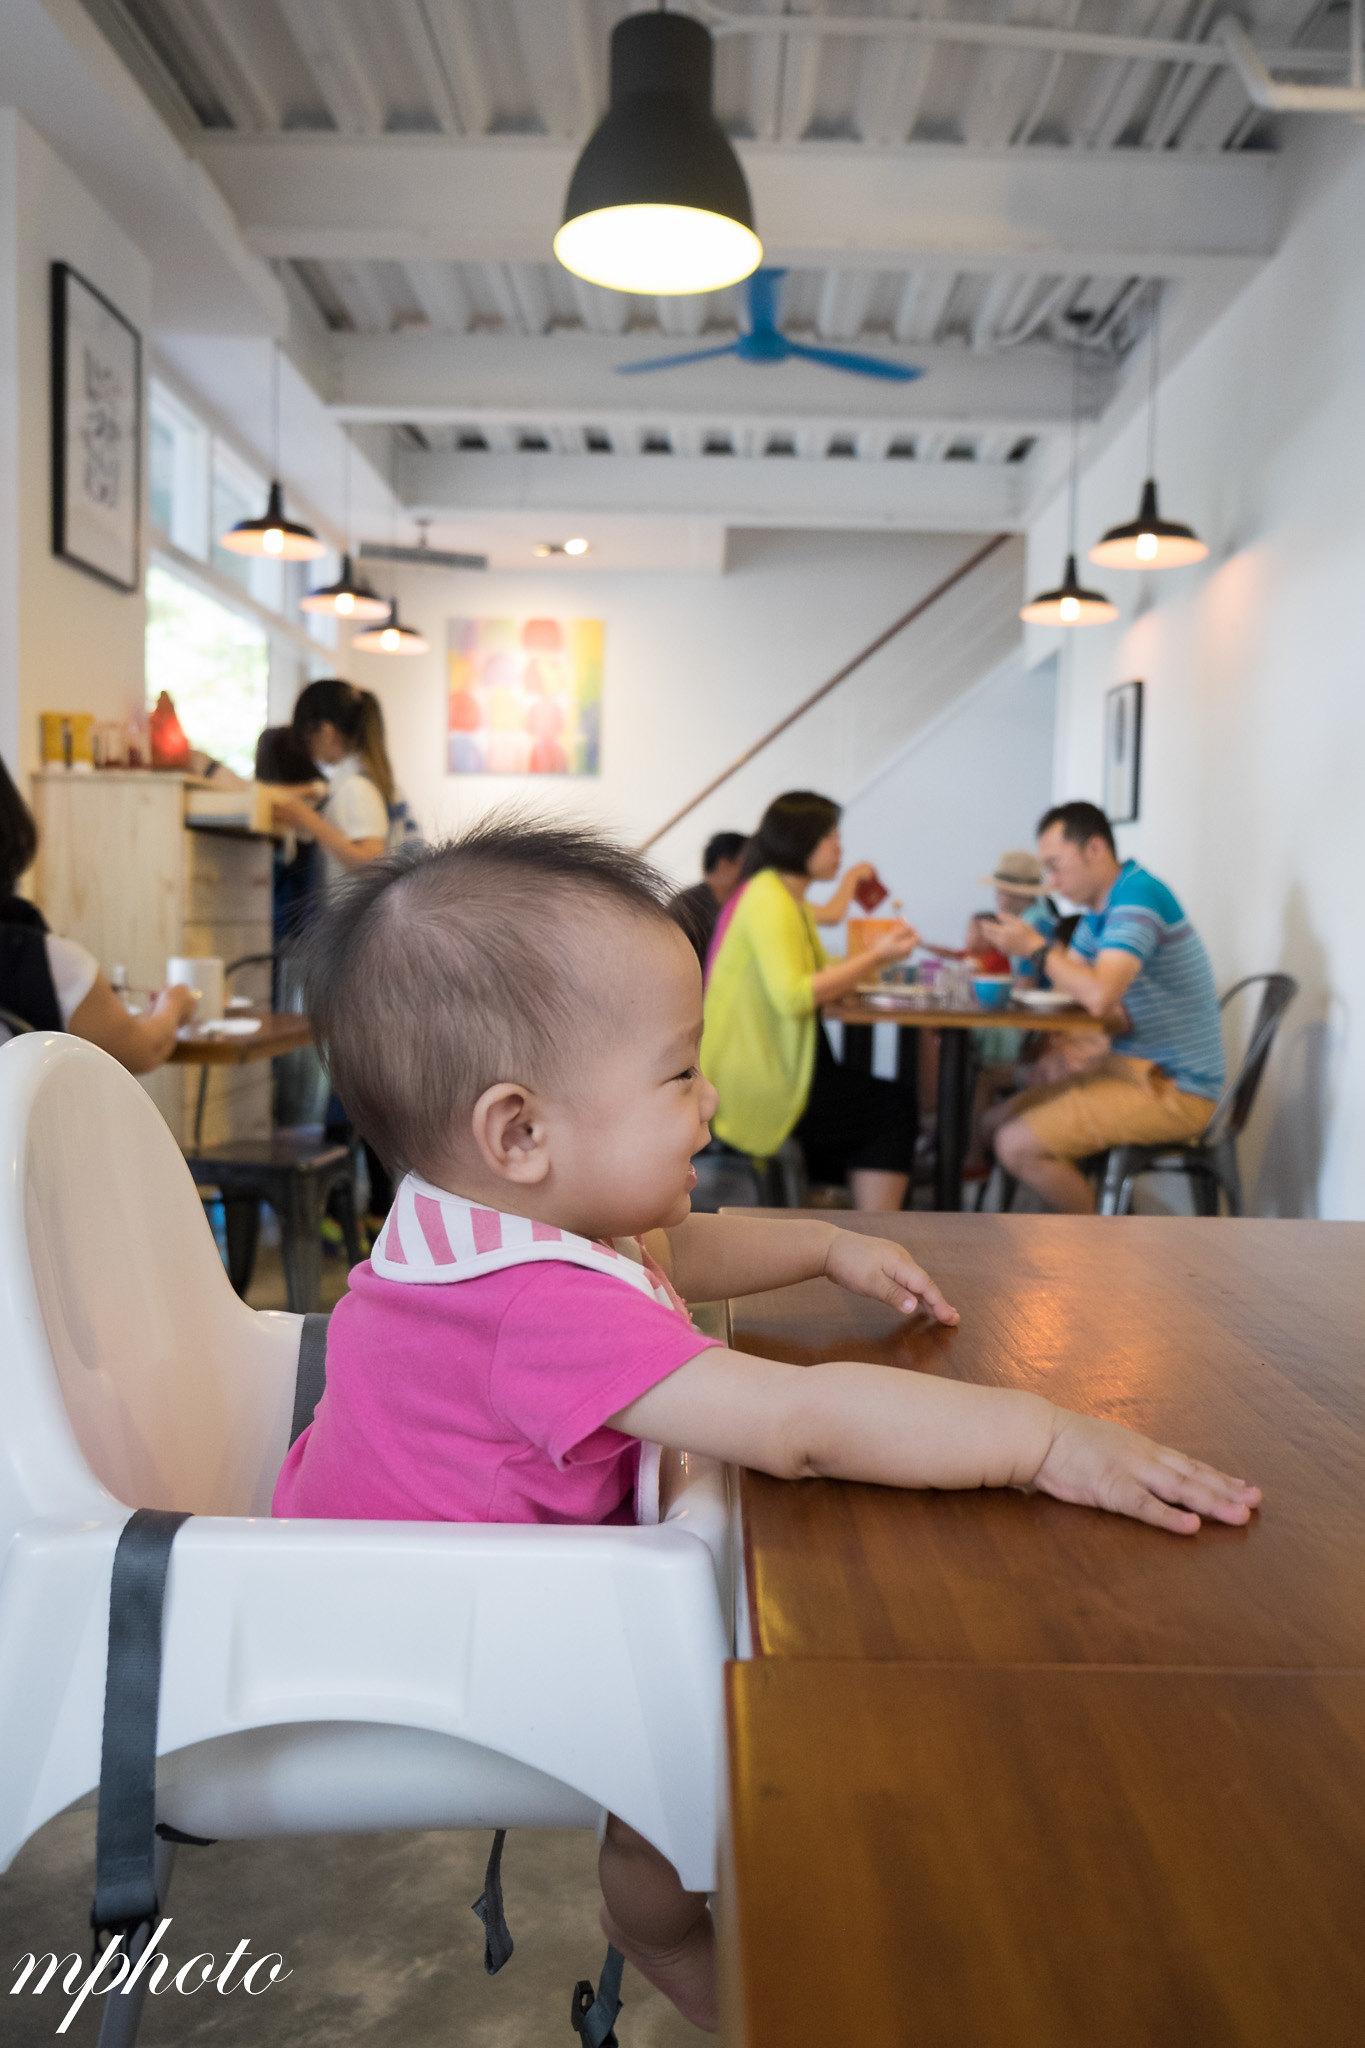 EGGIE BRUNCH & COFFEE | 台中早午餐 南屯 雕塑公園 TEAPIGS